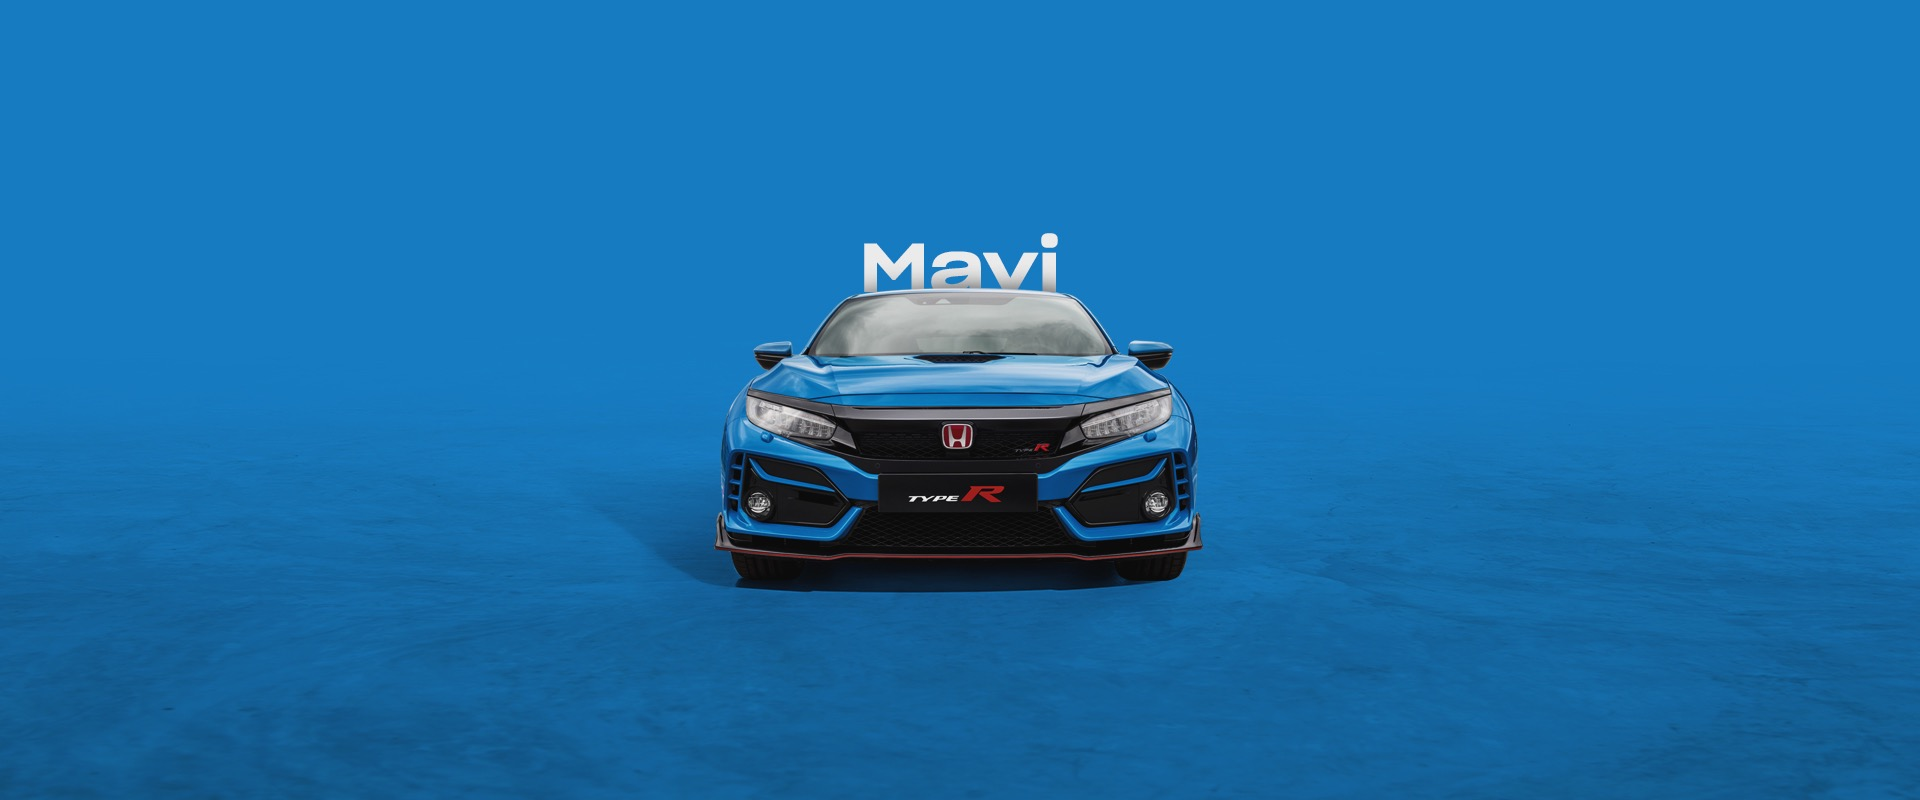 Honda Plaza  Kaval Mavi